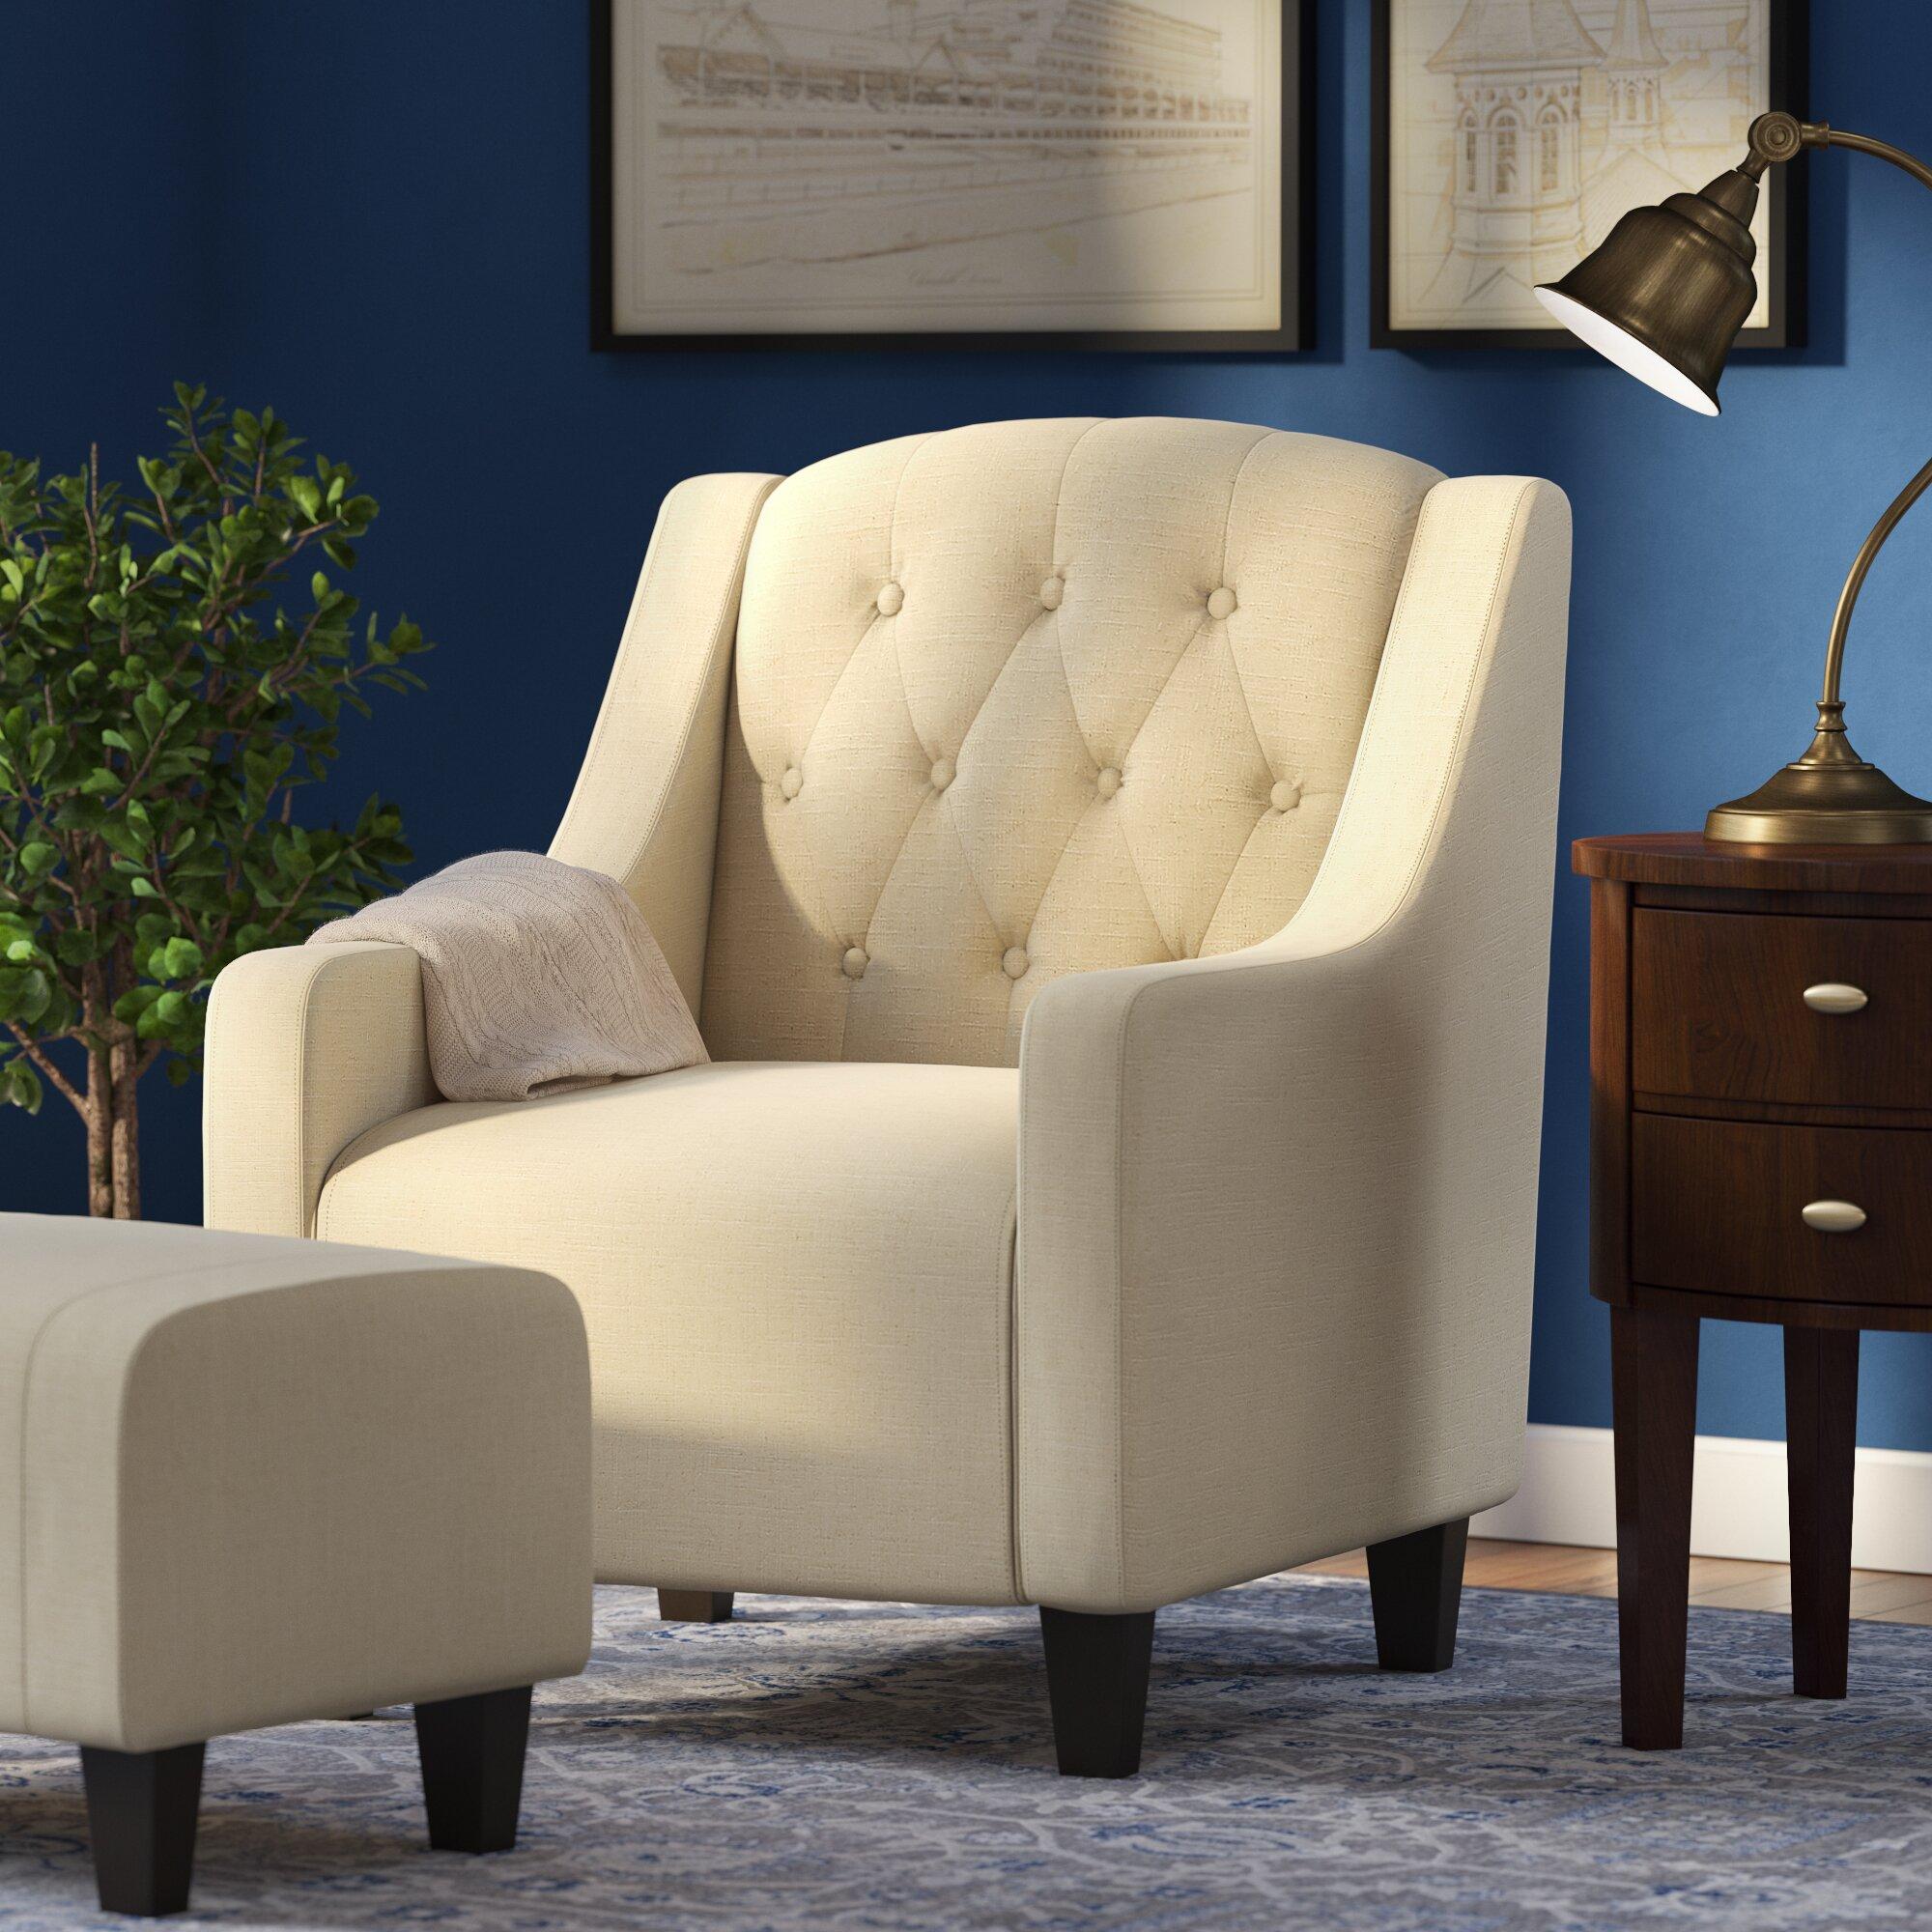 2 Piece Bradley Tufted Arm Chair Amp Ottoman Set Amp Reviews